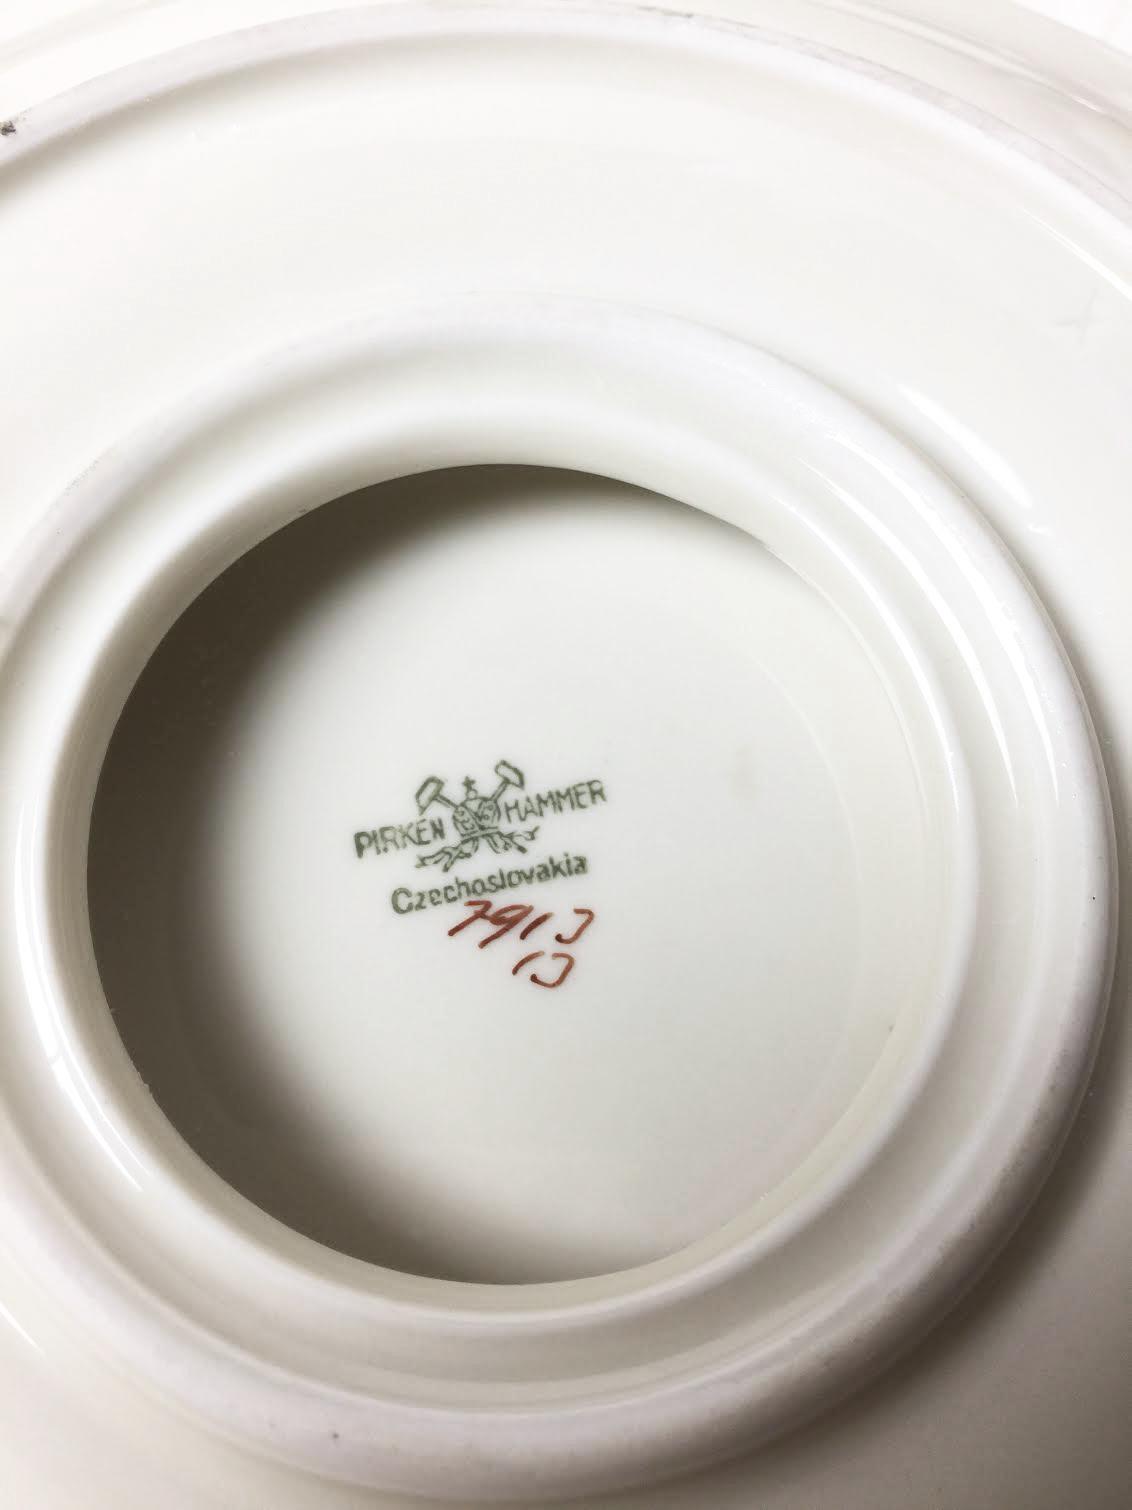 1920s Vintage Art Deco Style White u0026 Silver Dinnerware Set - 22 Pieces - Image 4  sc 1 st  Chairish & 1920s Vintage Art Deco Style White u0026 Silver Dinnerware Set - 22 ...